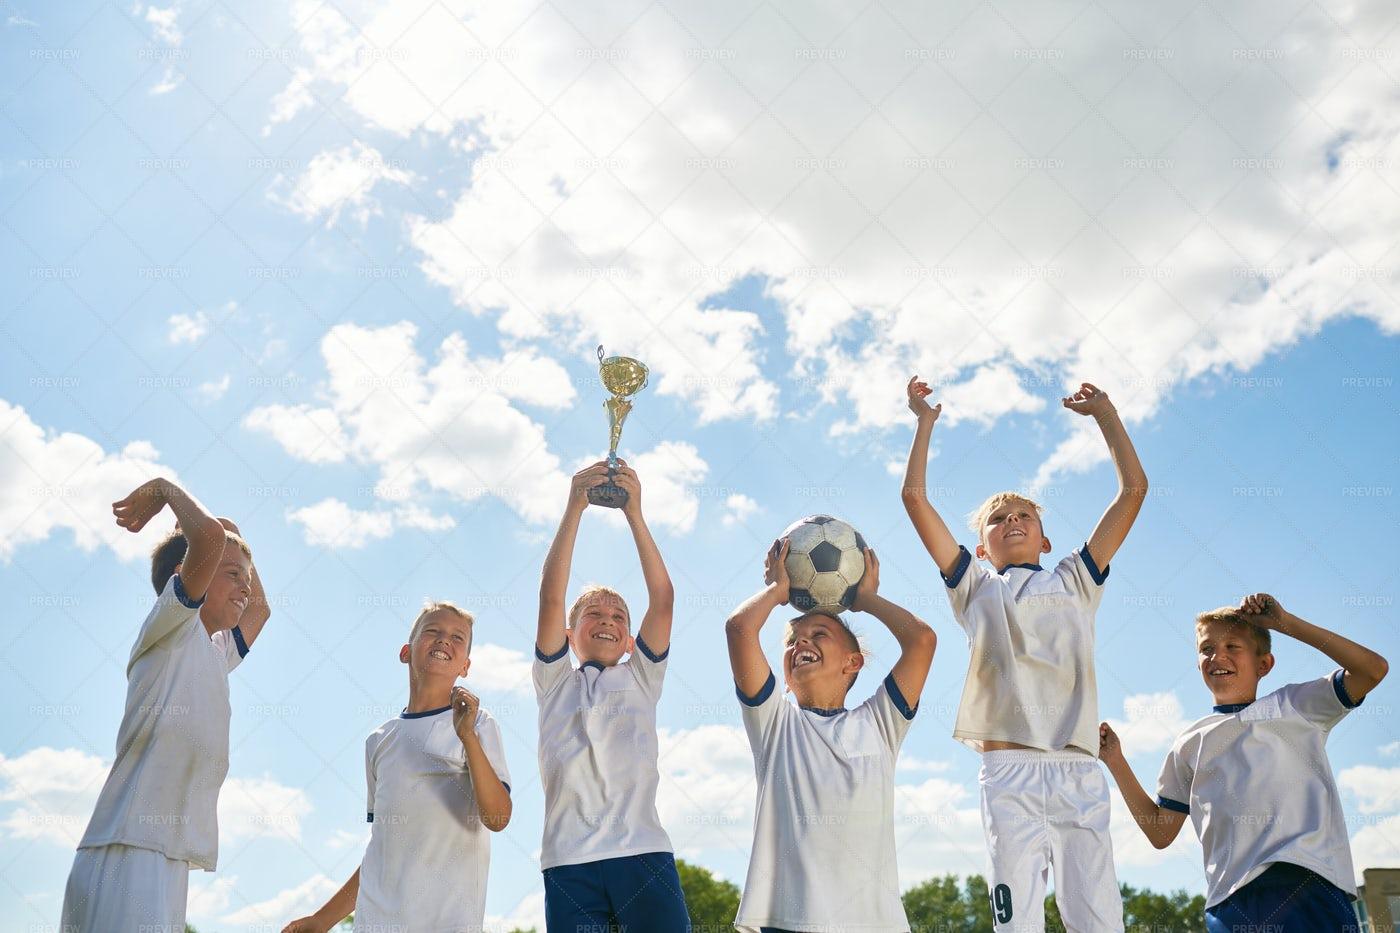 Junior Football Team Celebrating...: Stock Photos